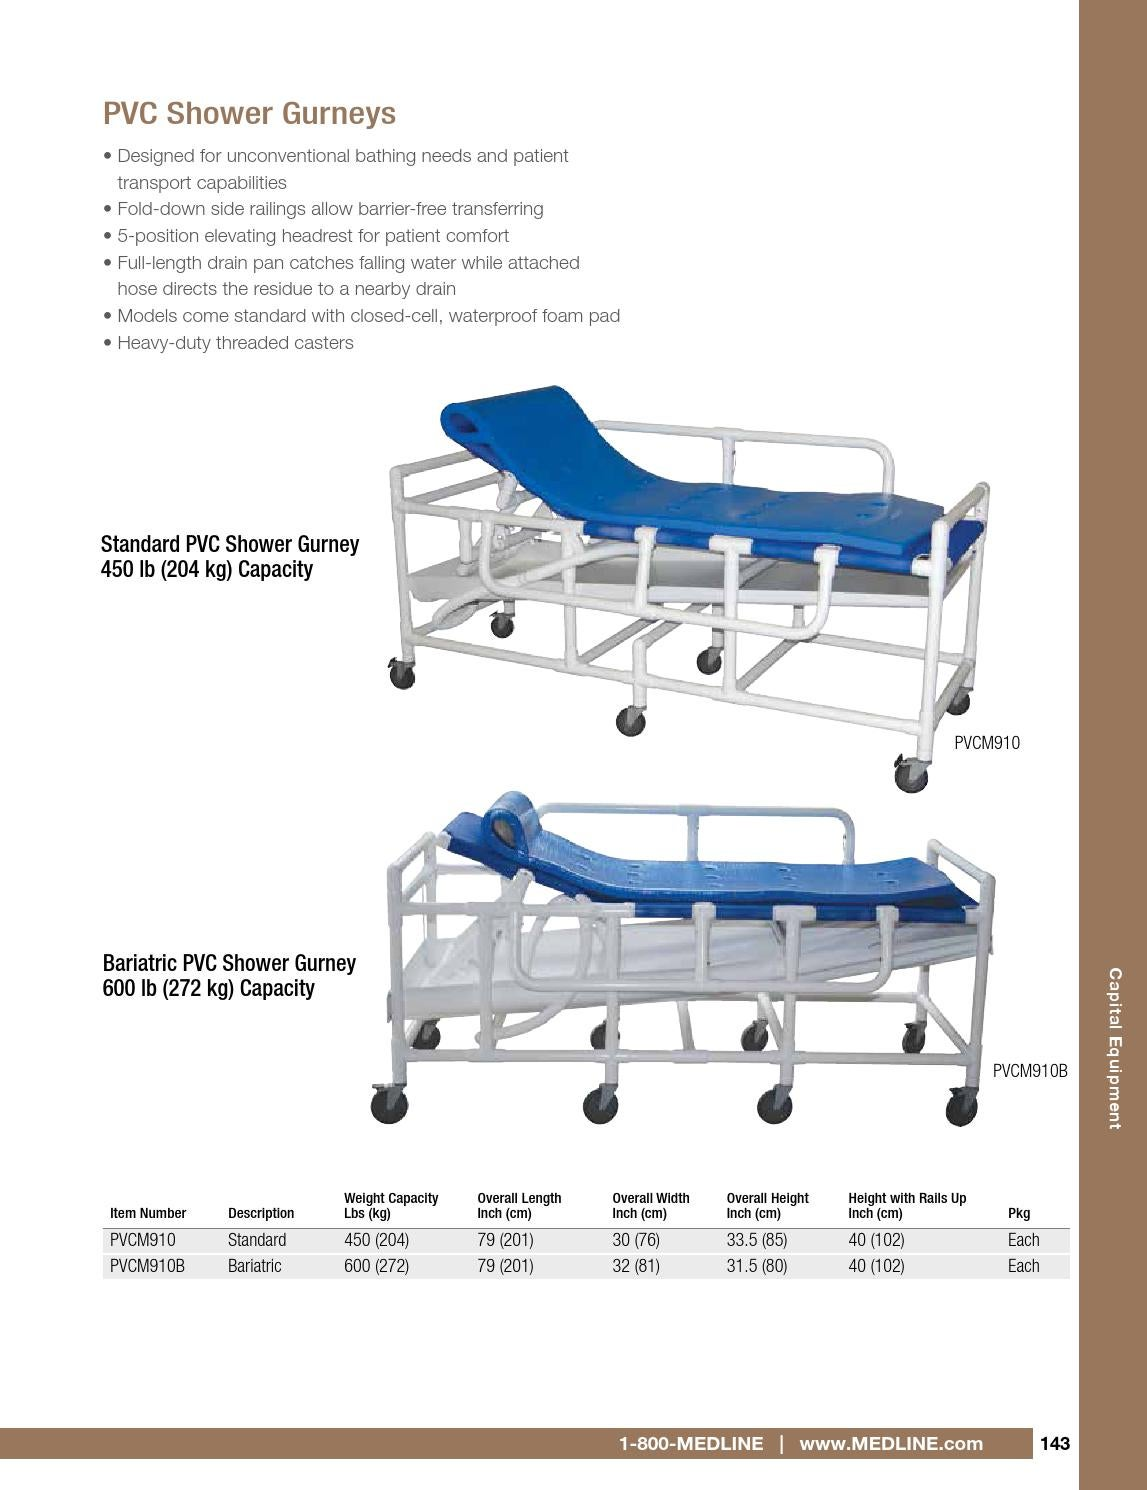 Medline Durable Medical Equipment Catalog by Medline Industries - issuu